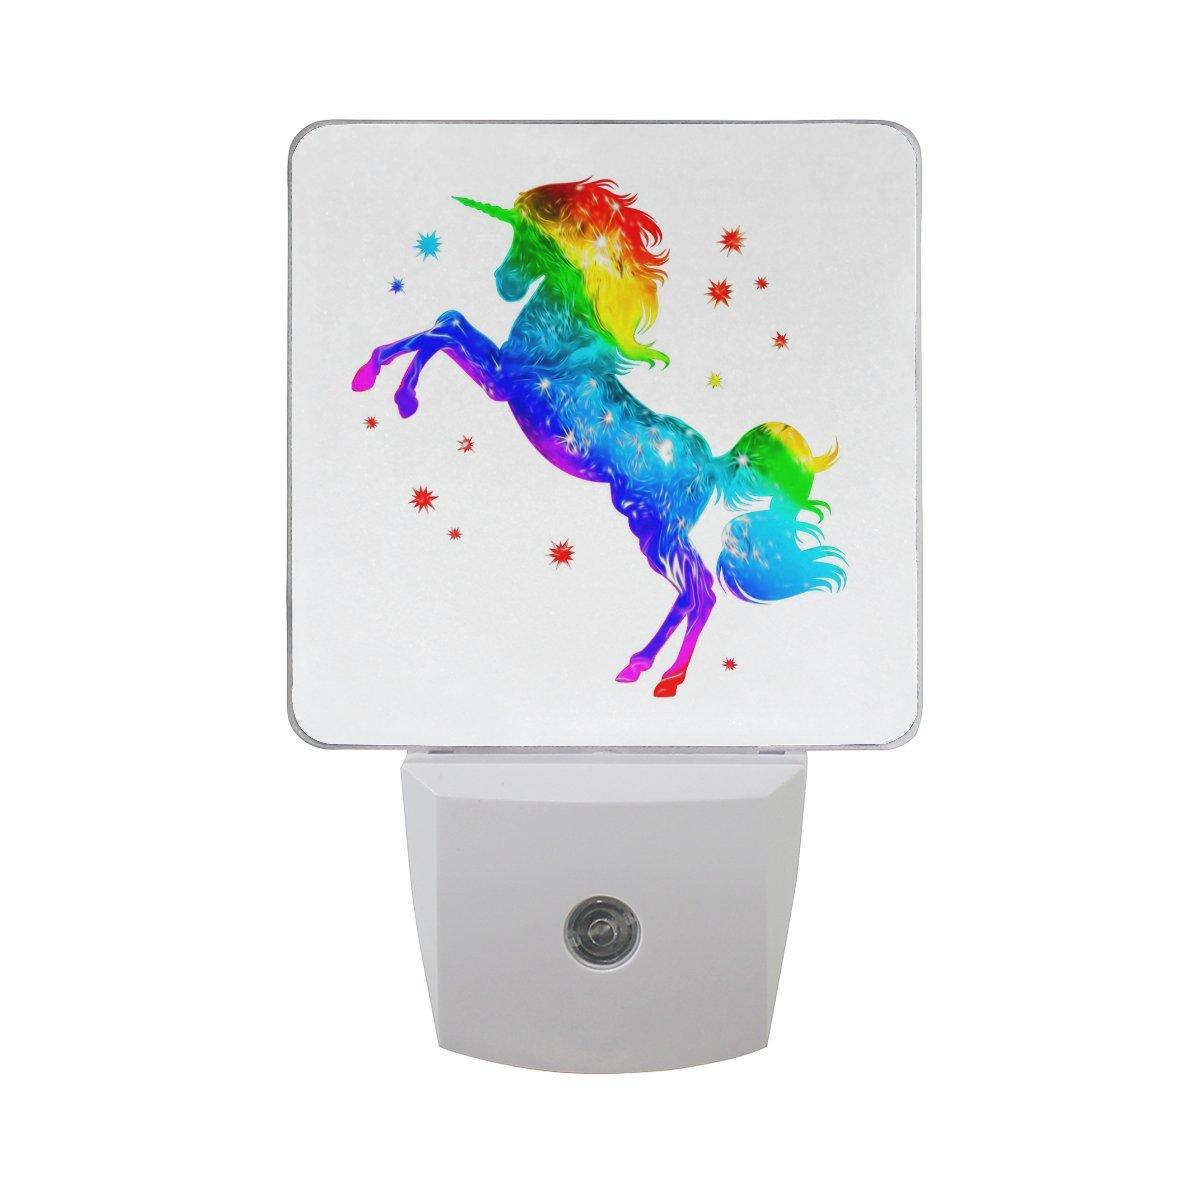 Naanle Set Of 2 Fantasy Colorful Rainbow Unicorn Animals Auto Sensor LED Dusk To Dawn Night Light Plug In Indoor for Adults